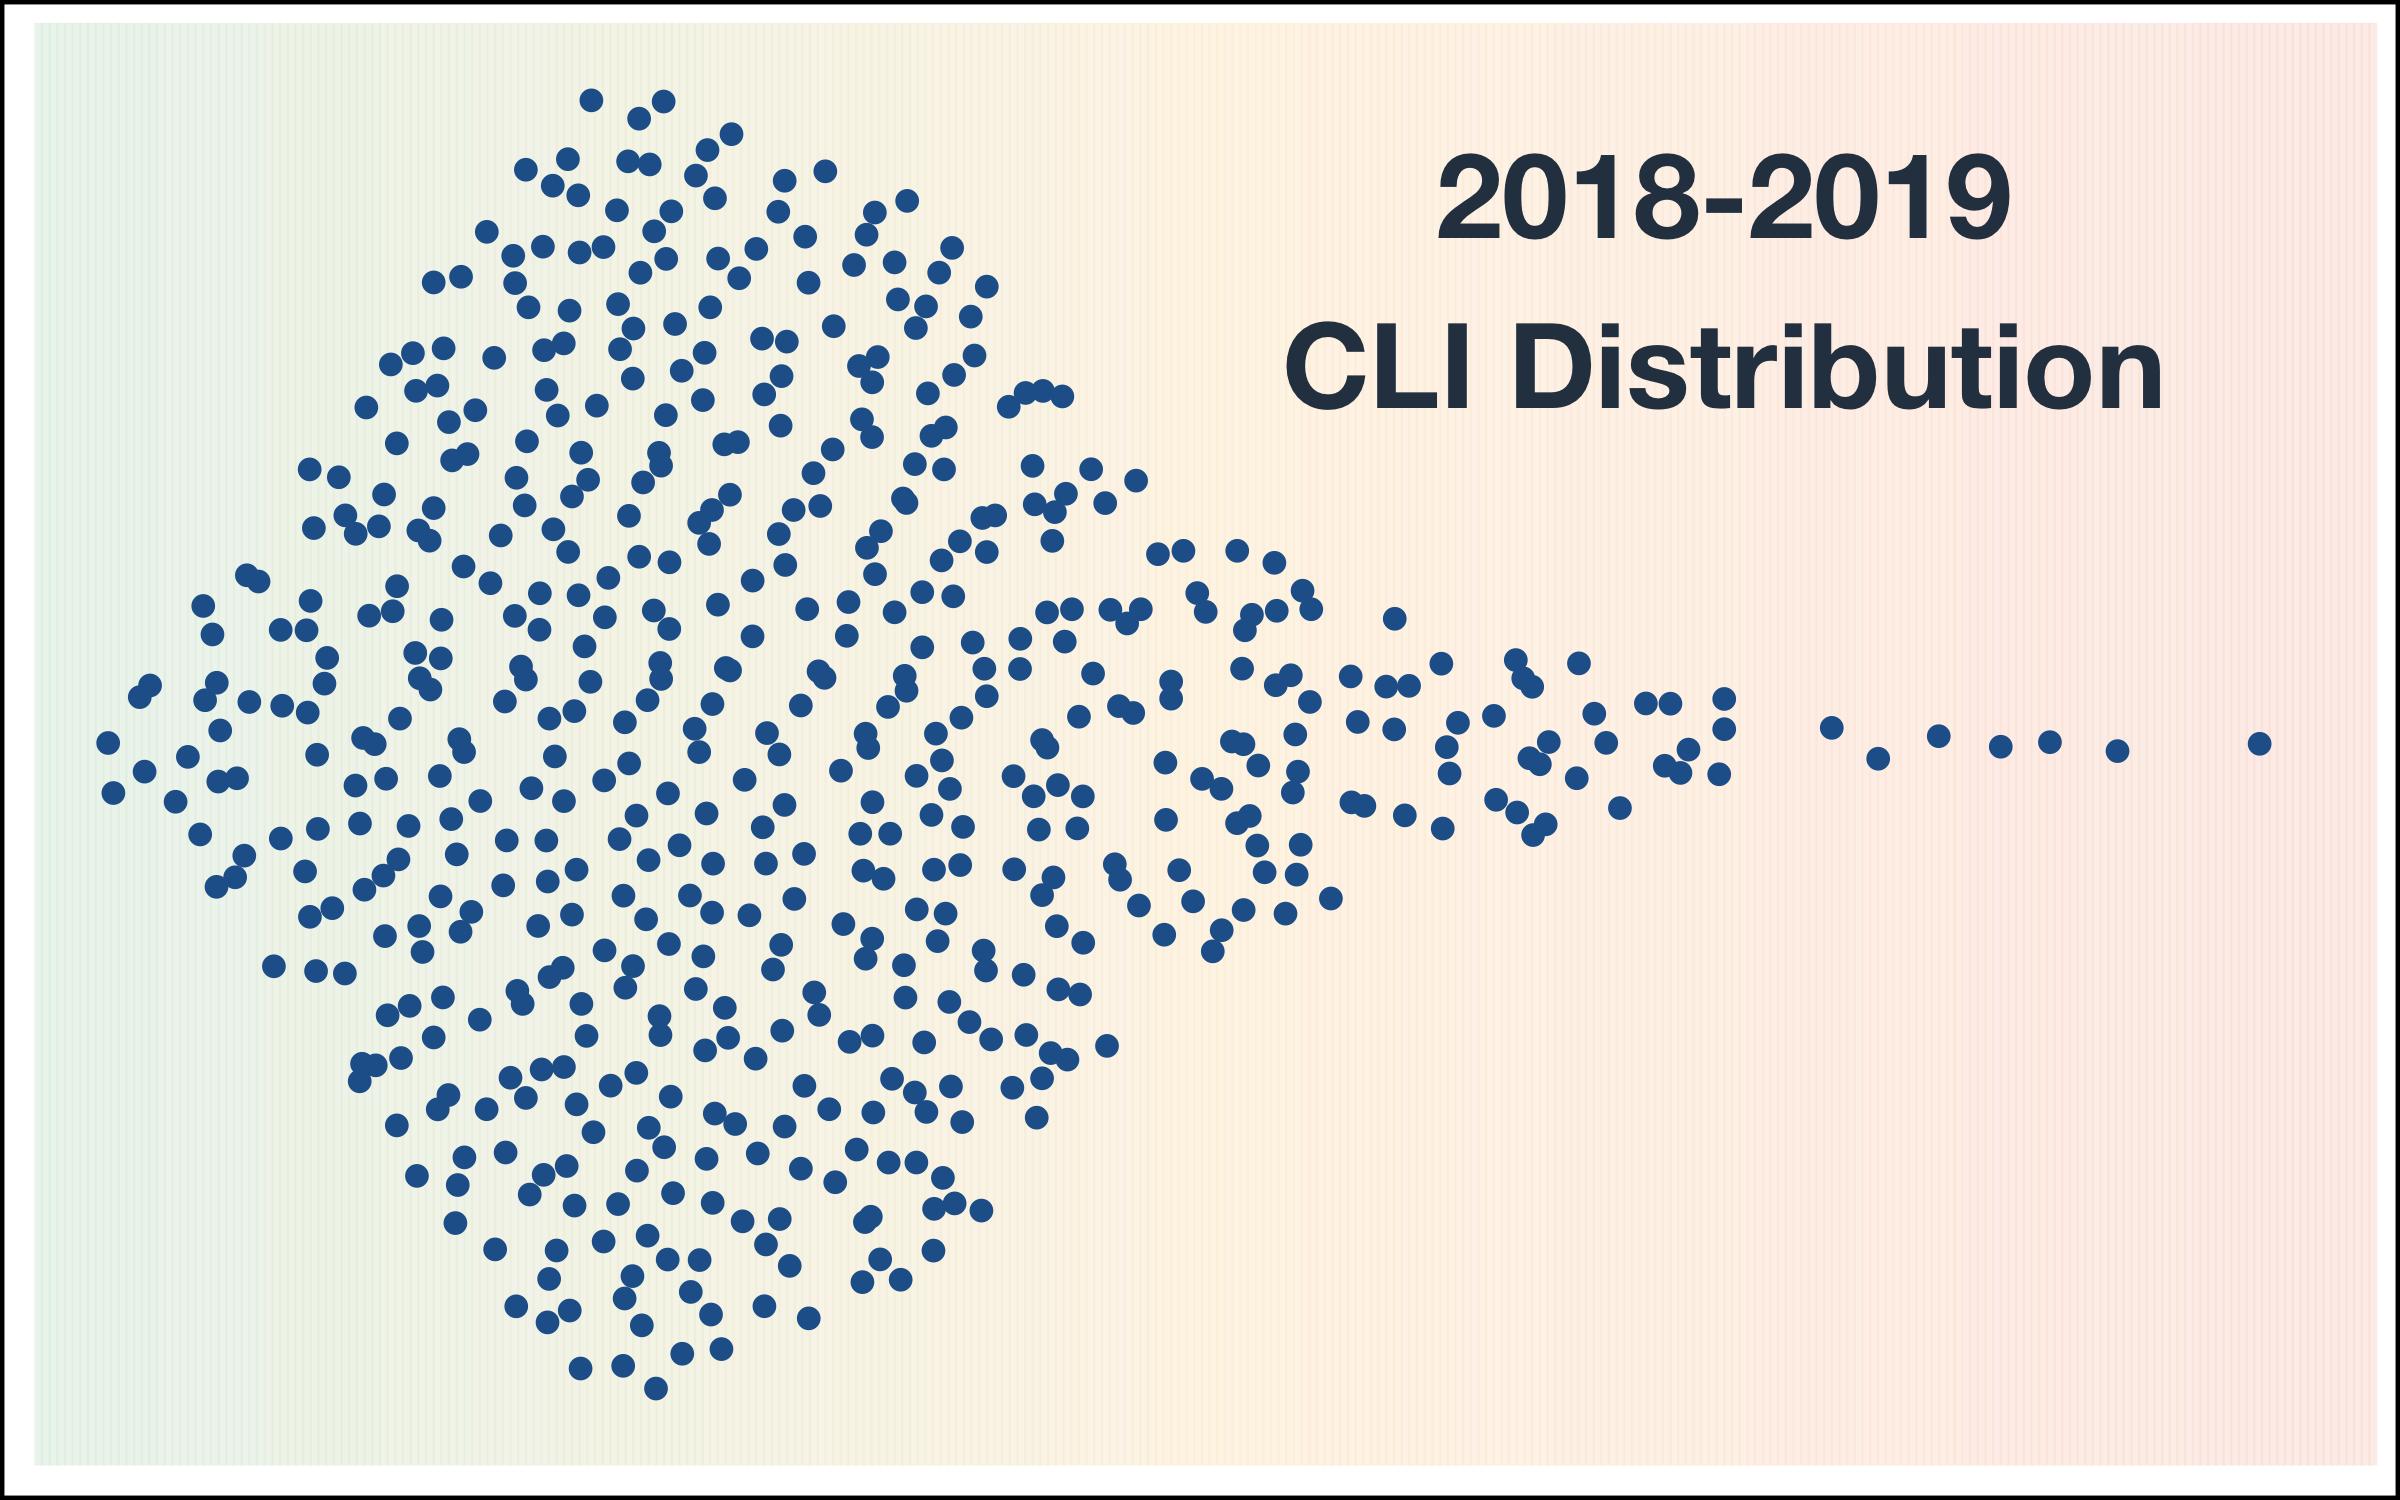 2018-2019 CLI Distribution